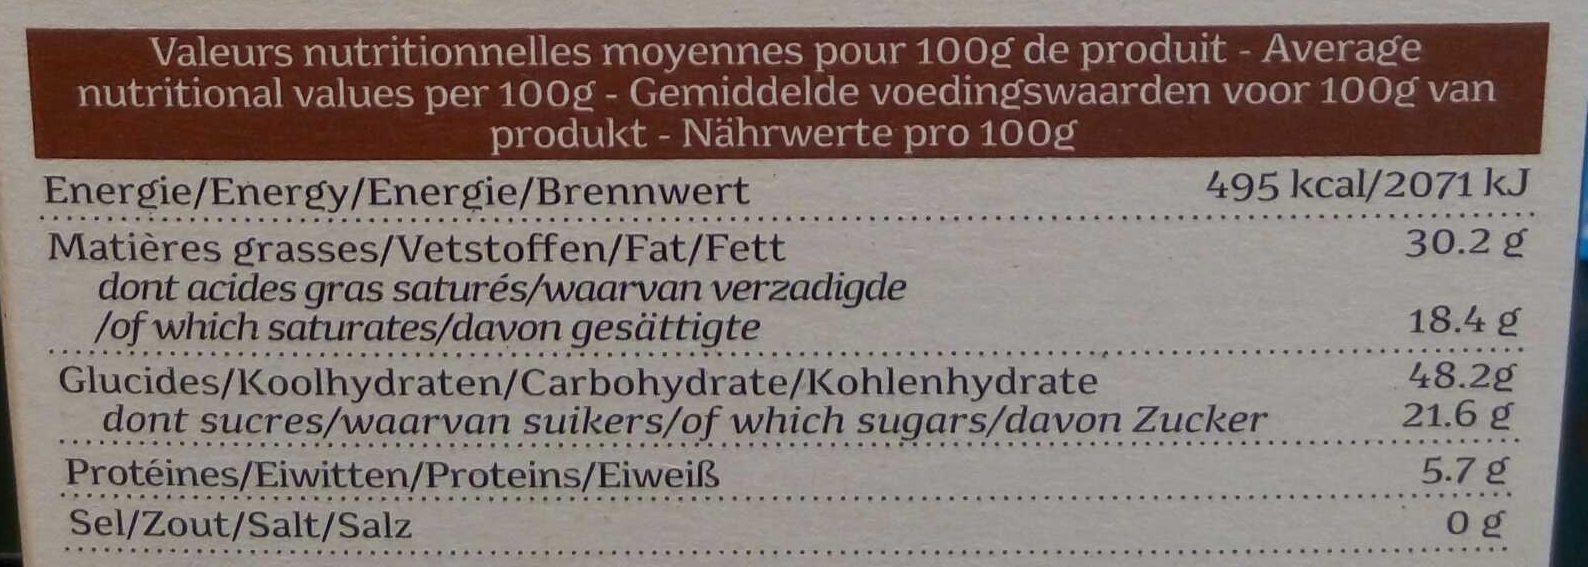 Charlotte chocolat - Voedingswaarden